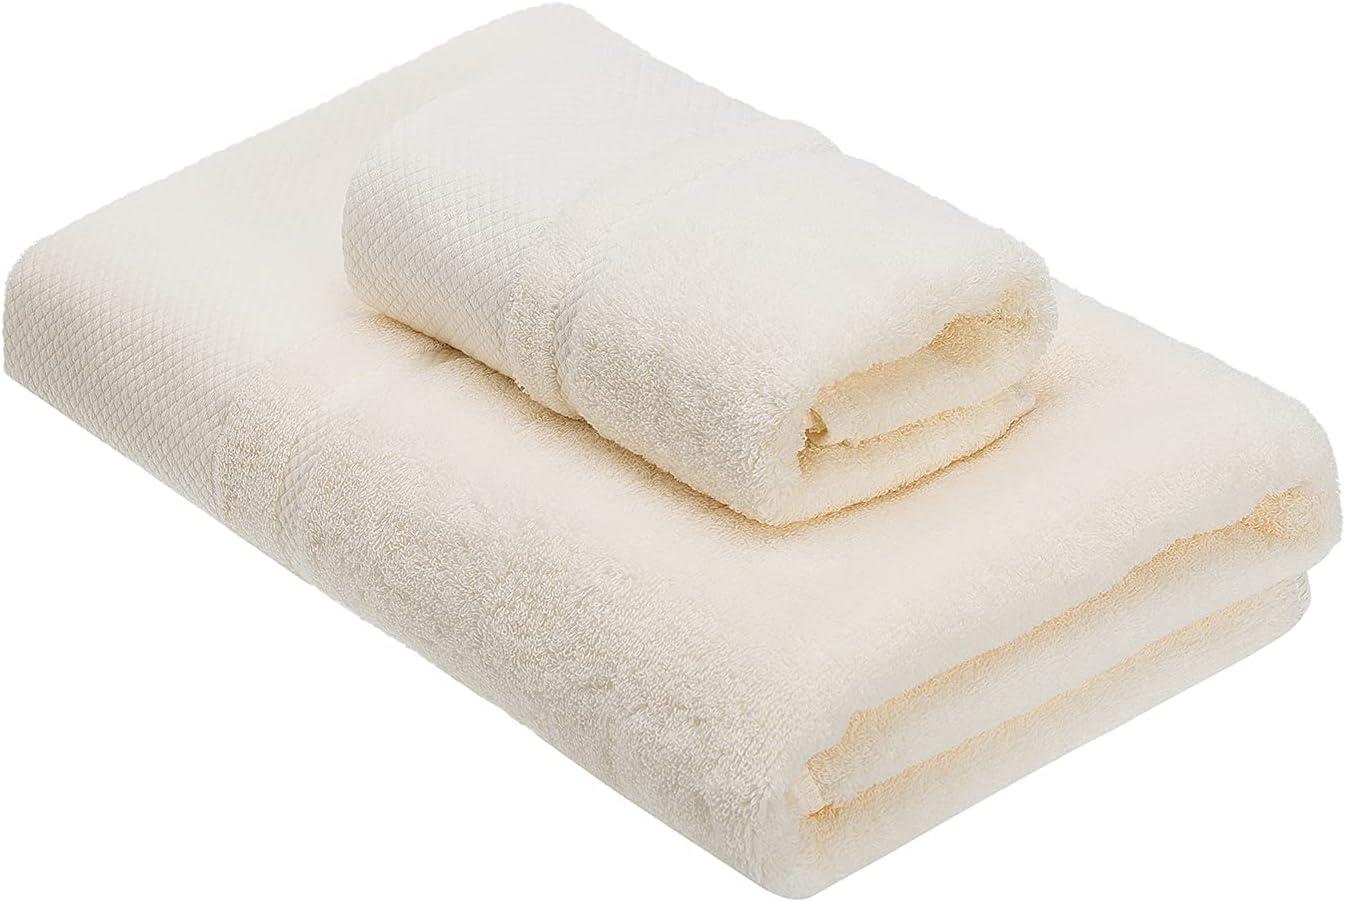 Bath Towel Set of 2 Quick-Dry 1 Beige 100% Ranking Super-cheap TOP14 T Cotton Towels